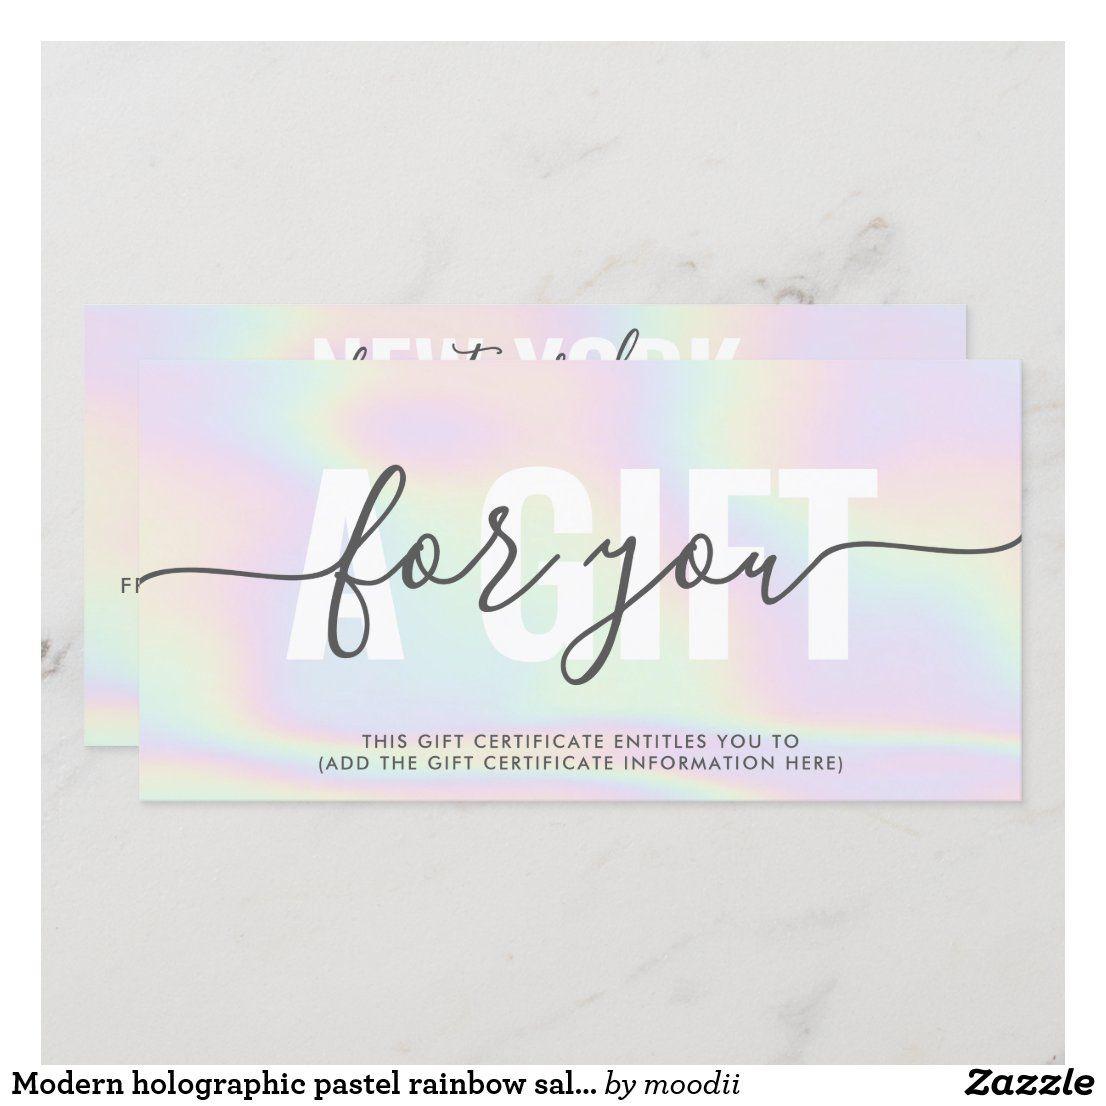 Modern Holographic Pastel Rainbow Salon Gift Card Zazzle Com Salon Gift Card Pastel Rainbow Gift Card